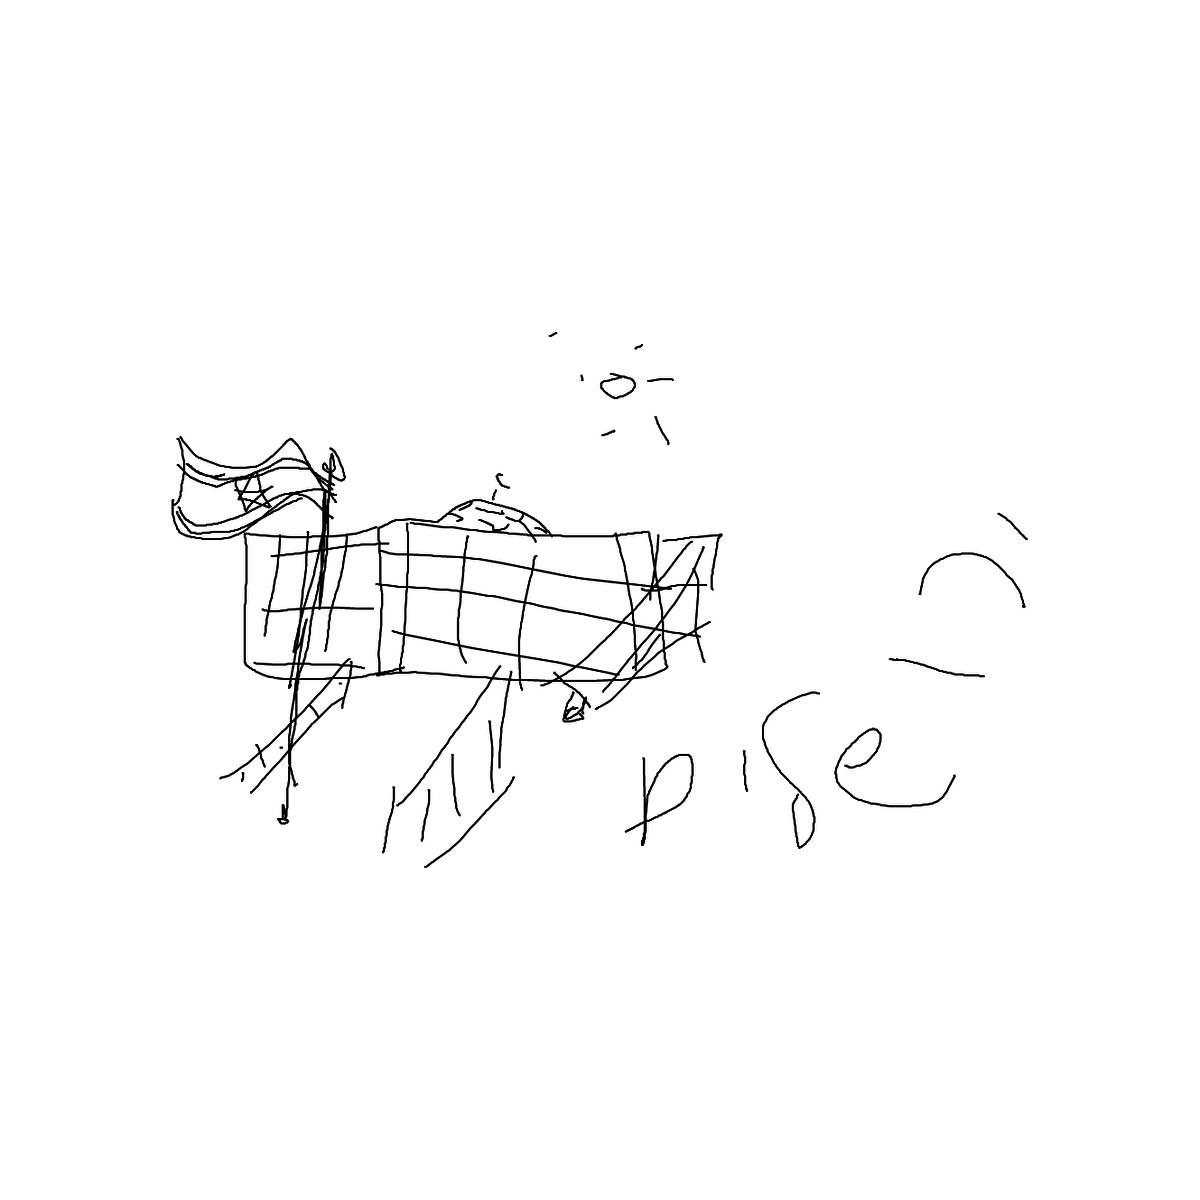 BAAAM drawing#22278 lat:31.7778396606445300lng: 35.2342948913574200